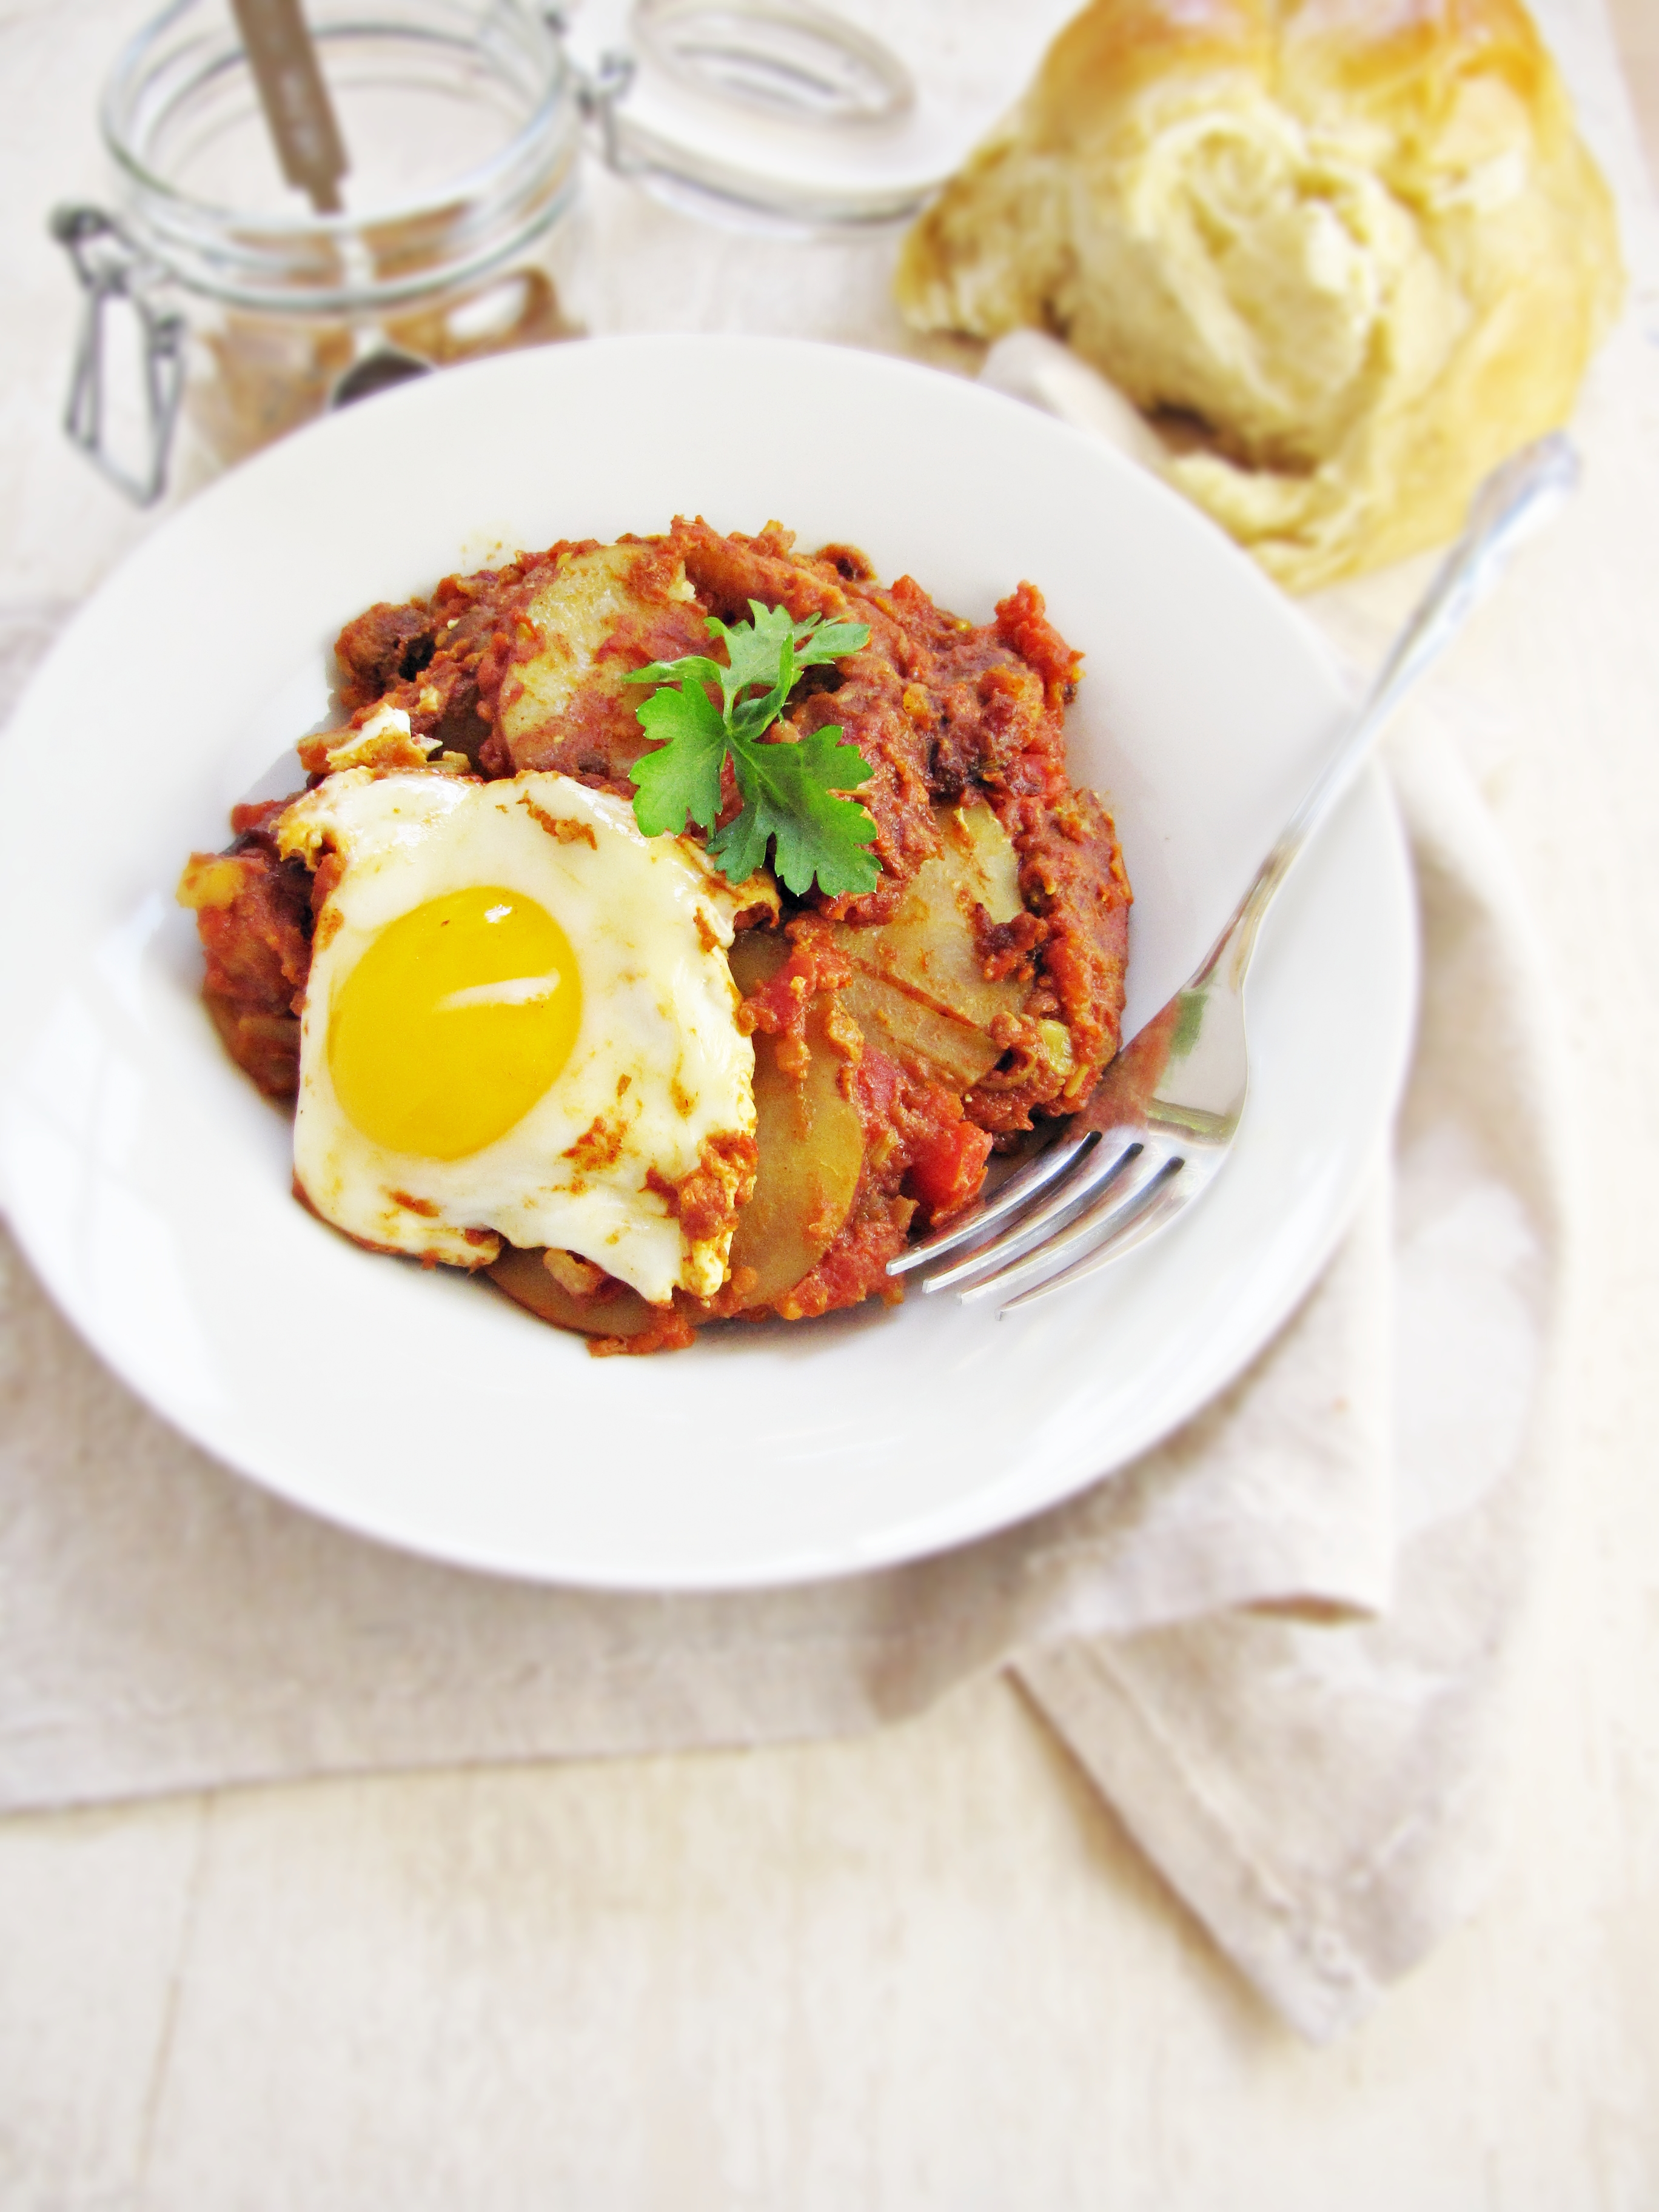 Greatist Collaboration: Shakshuka with Sausage and Potatoes